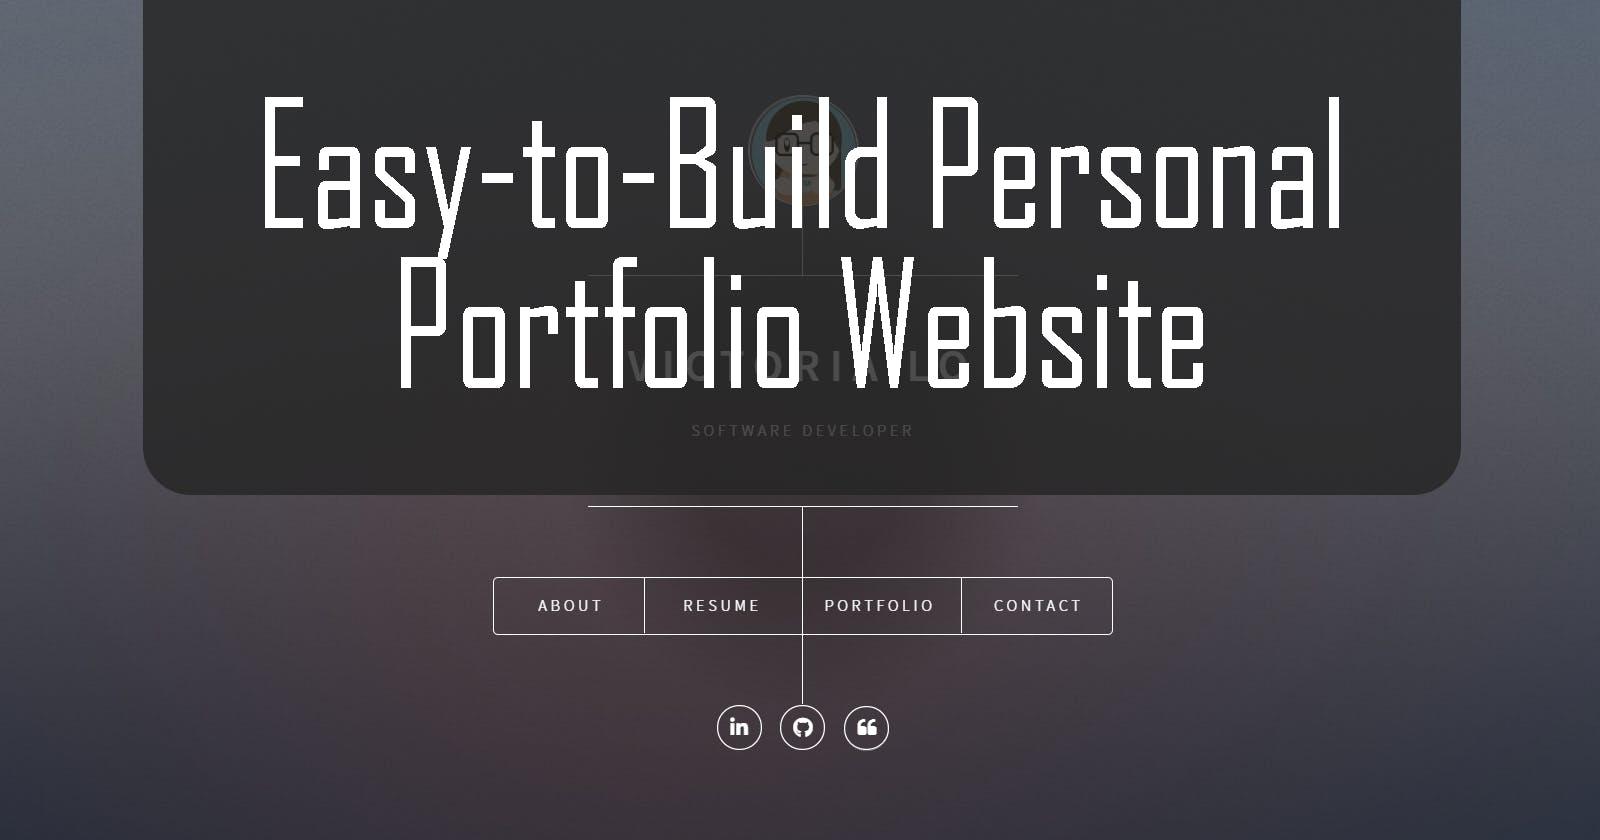 How to Build your Personal Portfolio Website